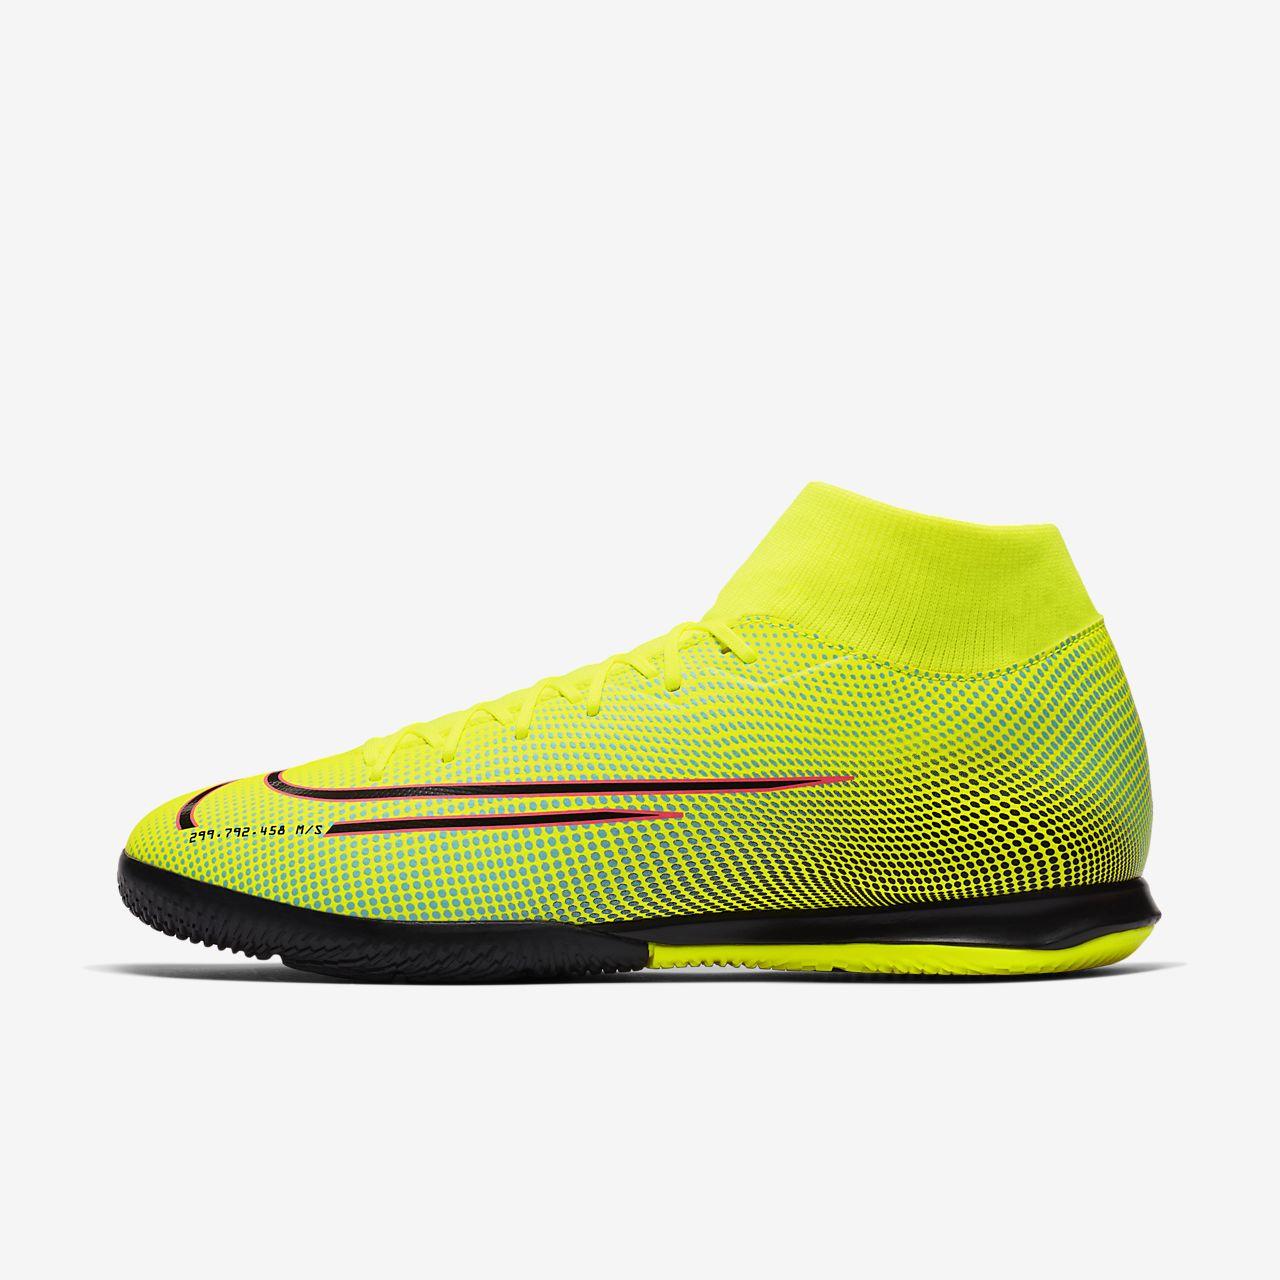 Chaussure de football en salle Nike Mercurial Superfly 7 Academy MDS IC